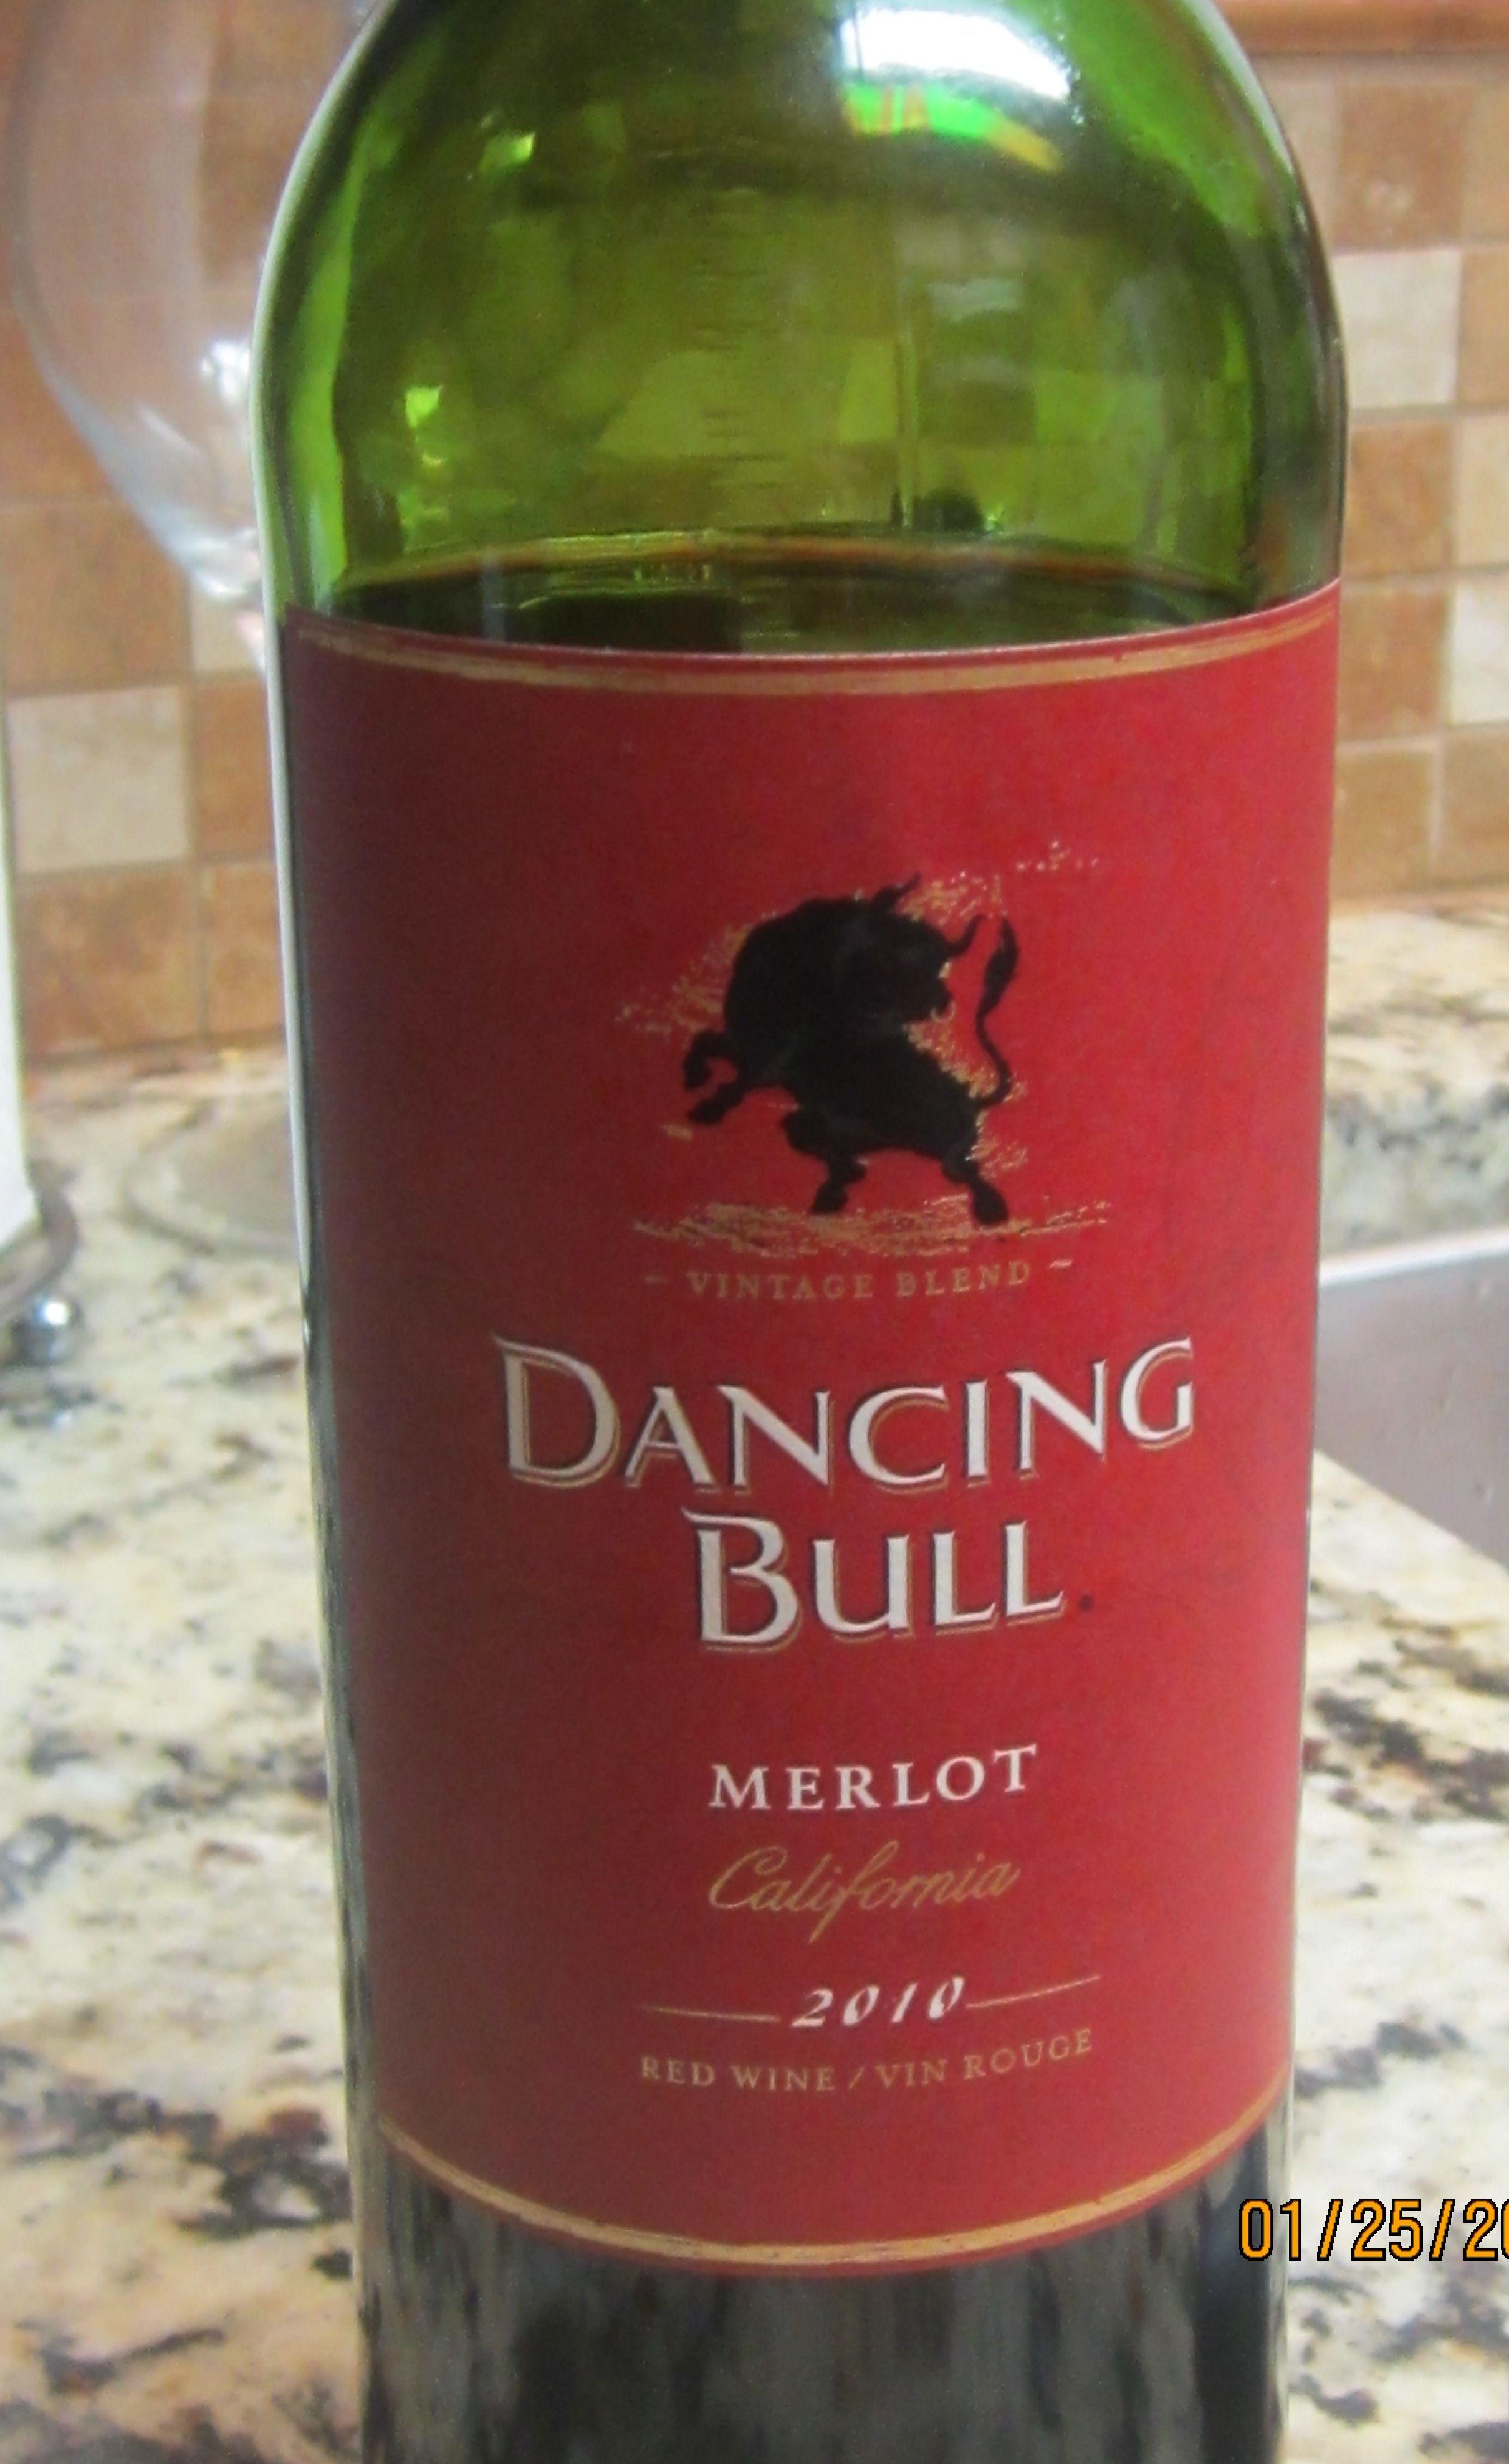 Dancing Bull Merlot Wine Bottle Wines Hubby Love